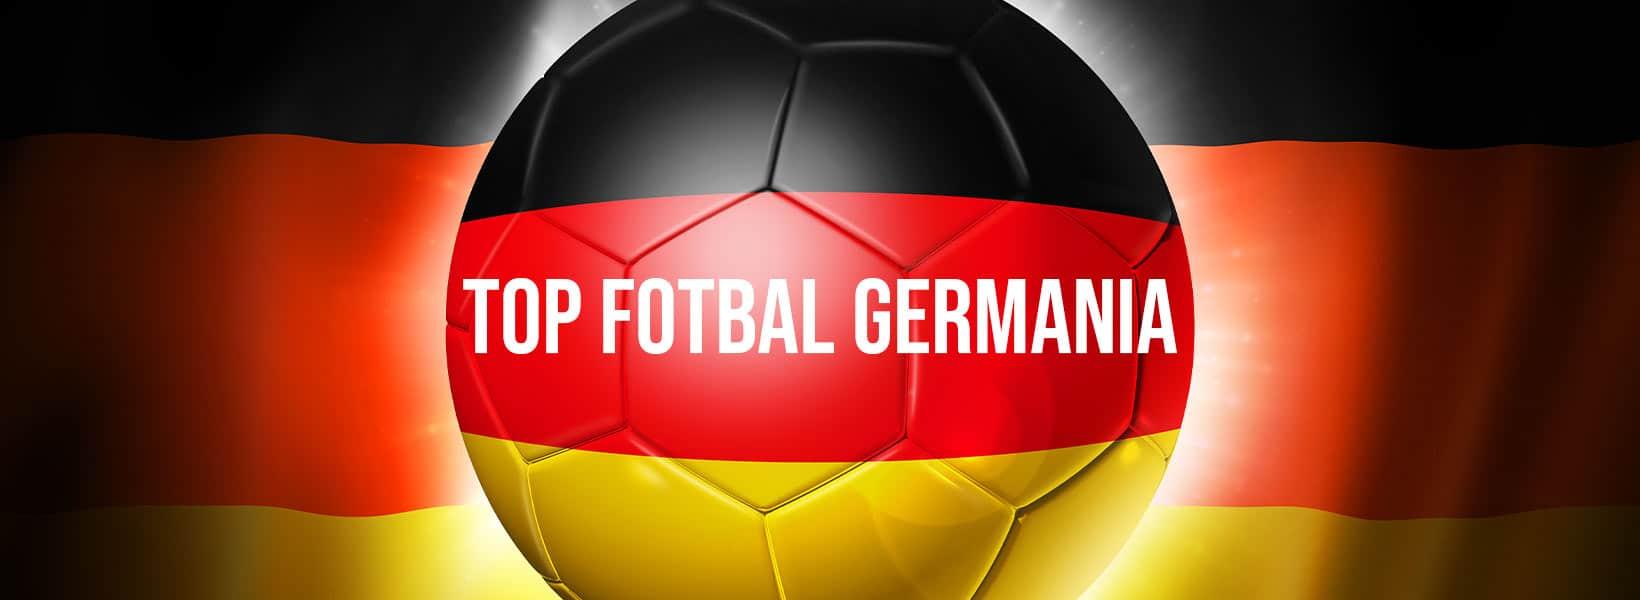 echipe de fotbal din Germania